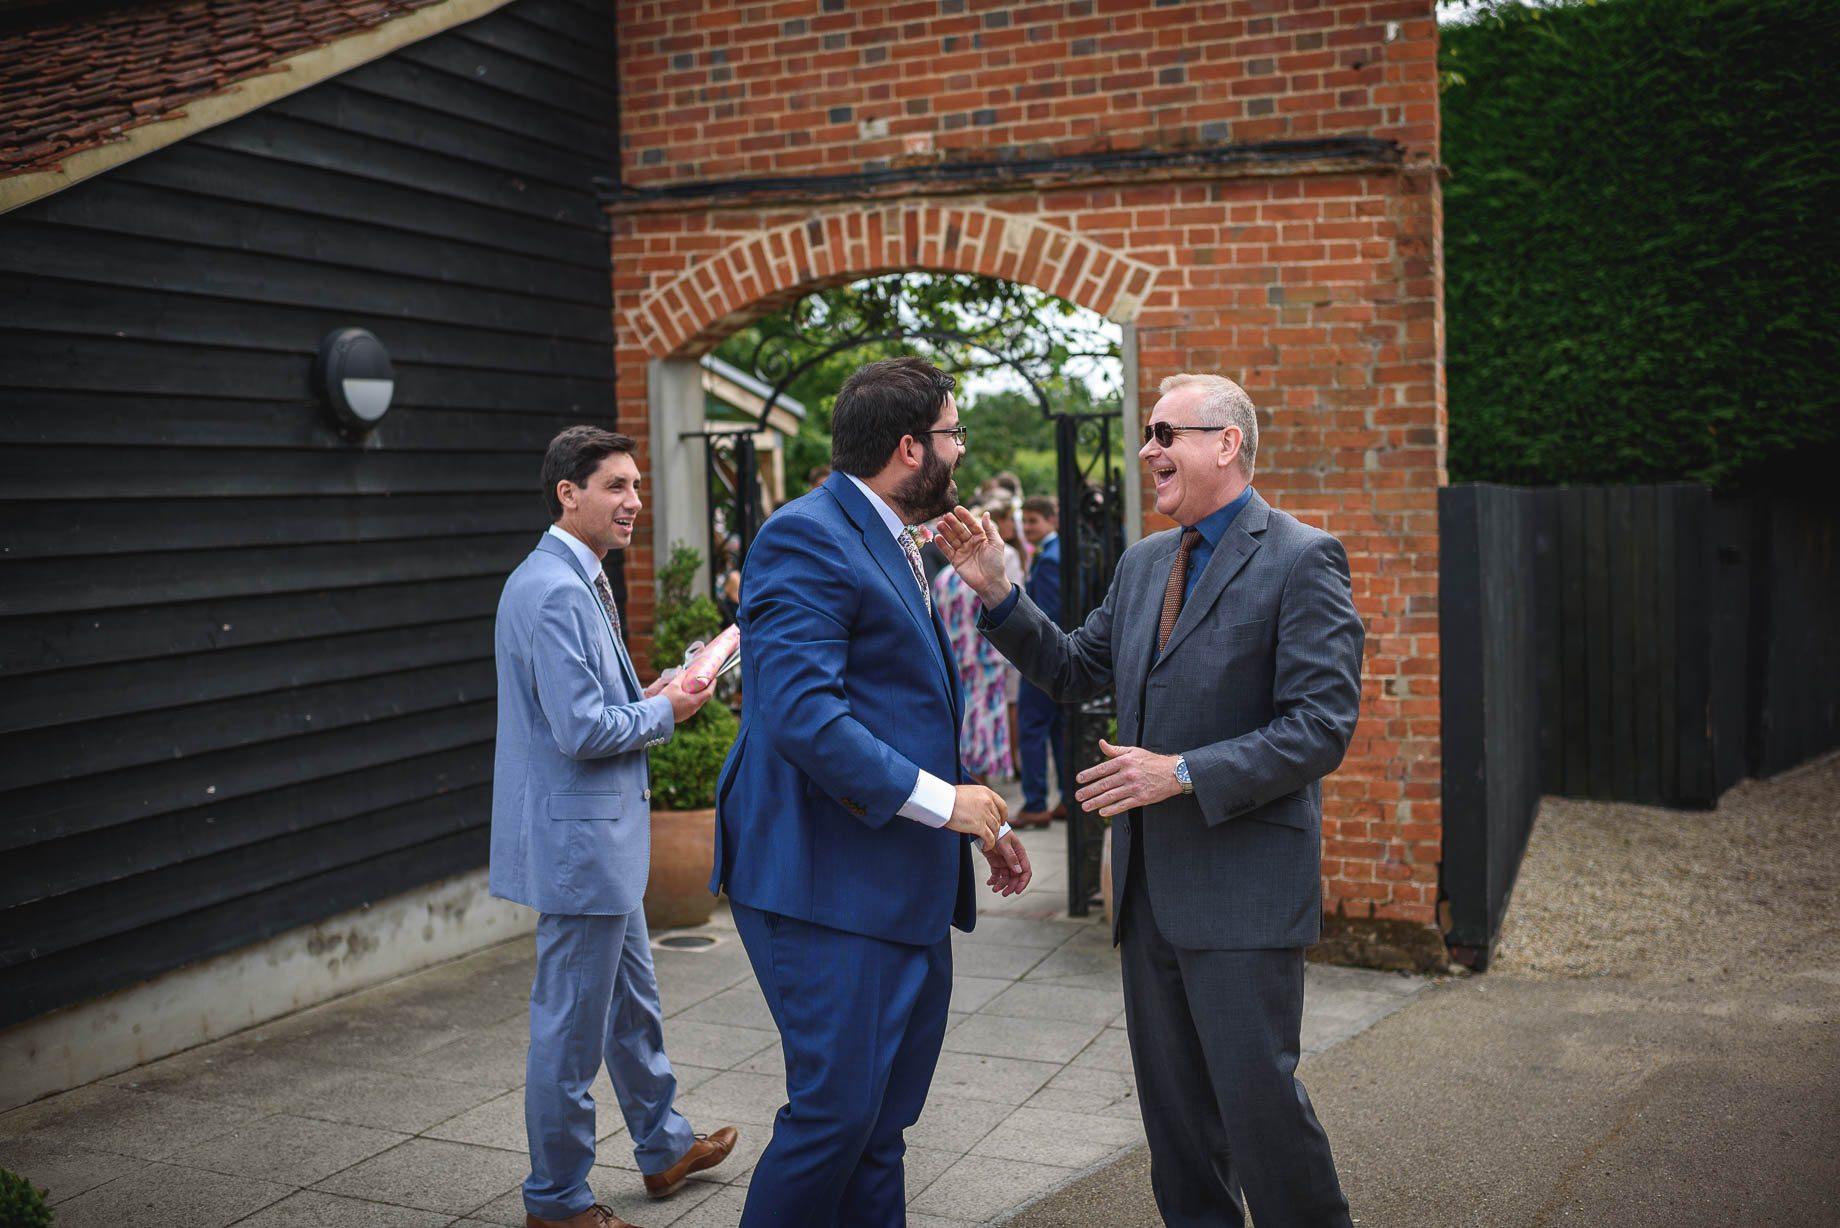 Gaynes Park wedding photography - Guy Collier Photography - Rachel and Jon (44 of 169)